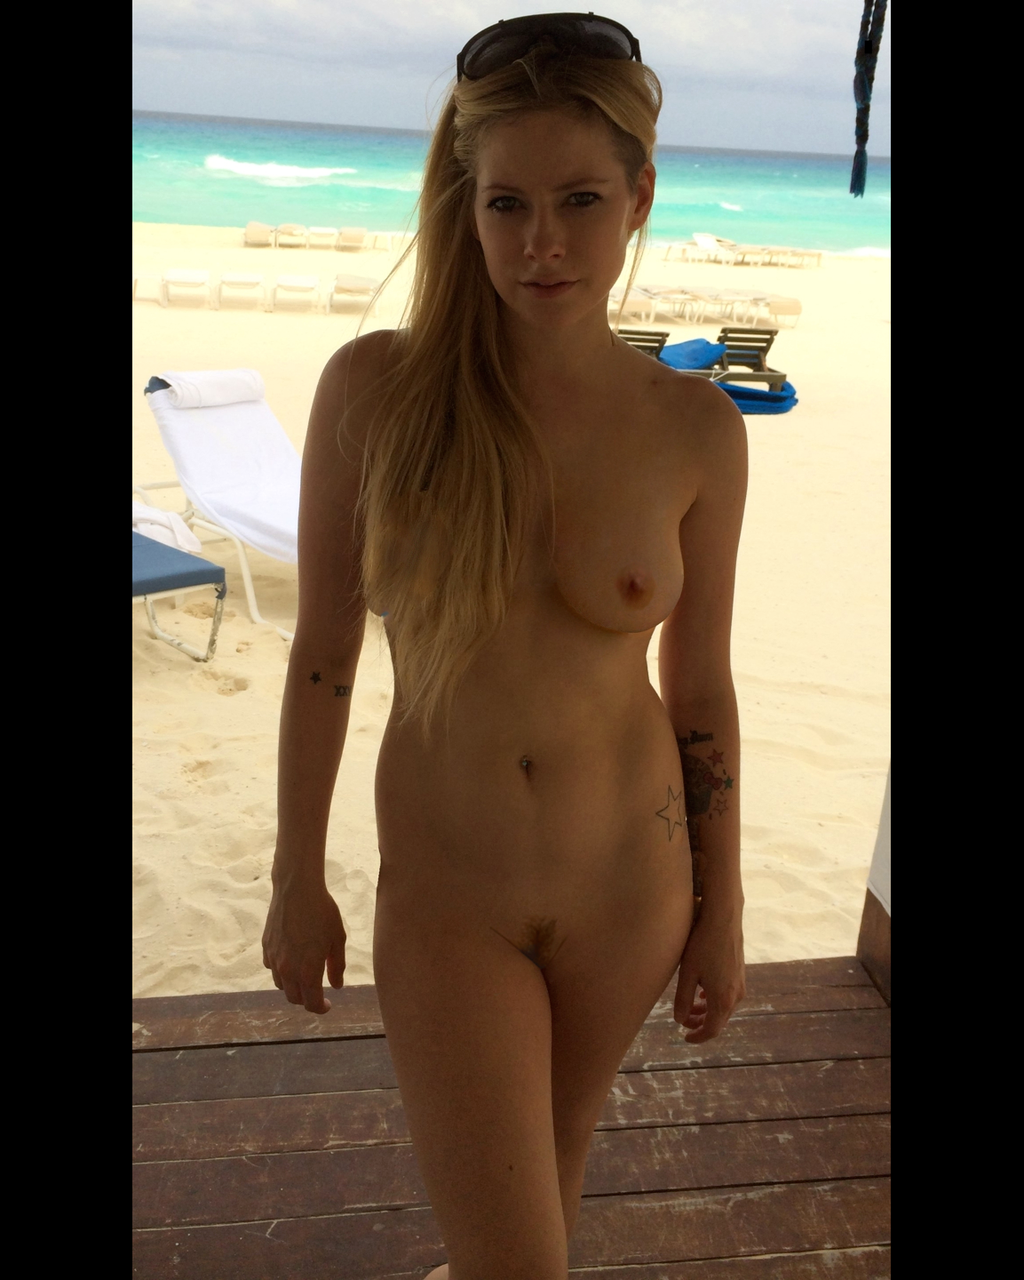 Avril Lavigne Leaked Pics photo 15